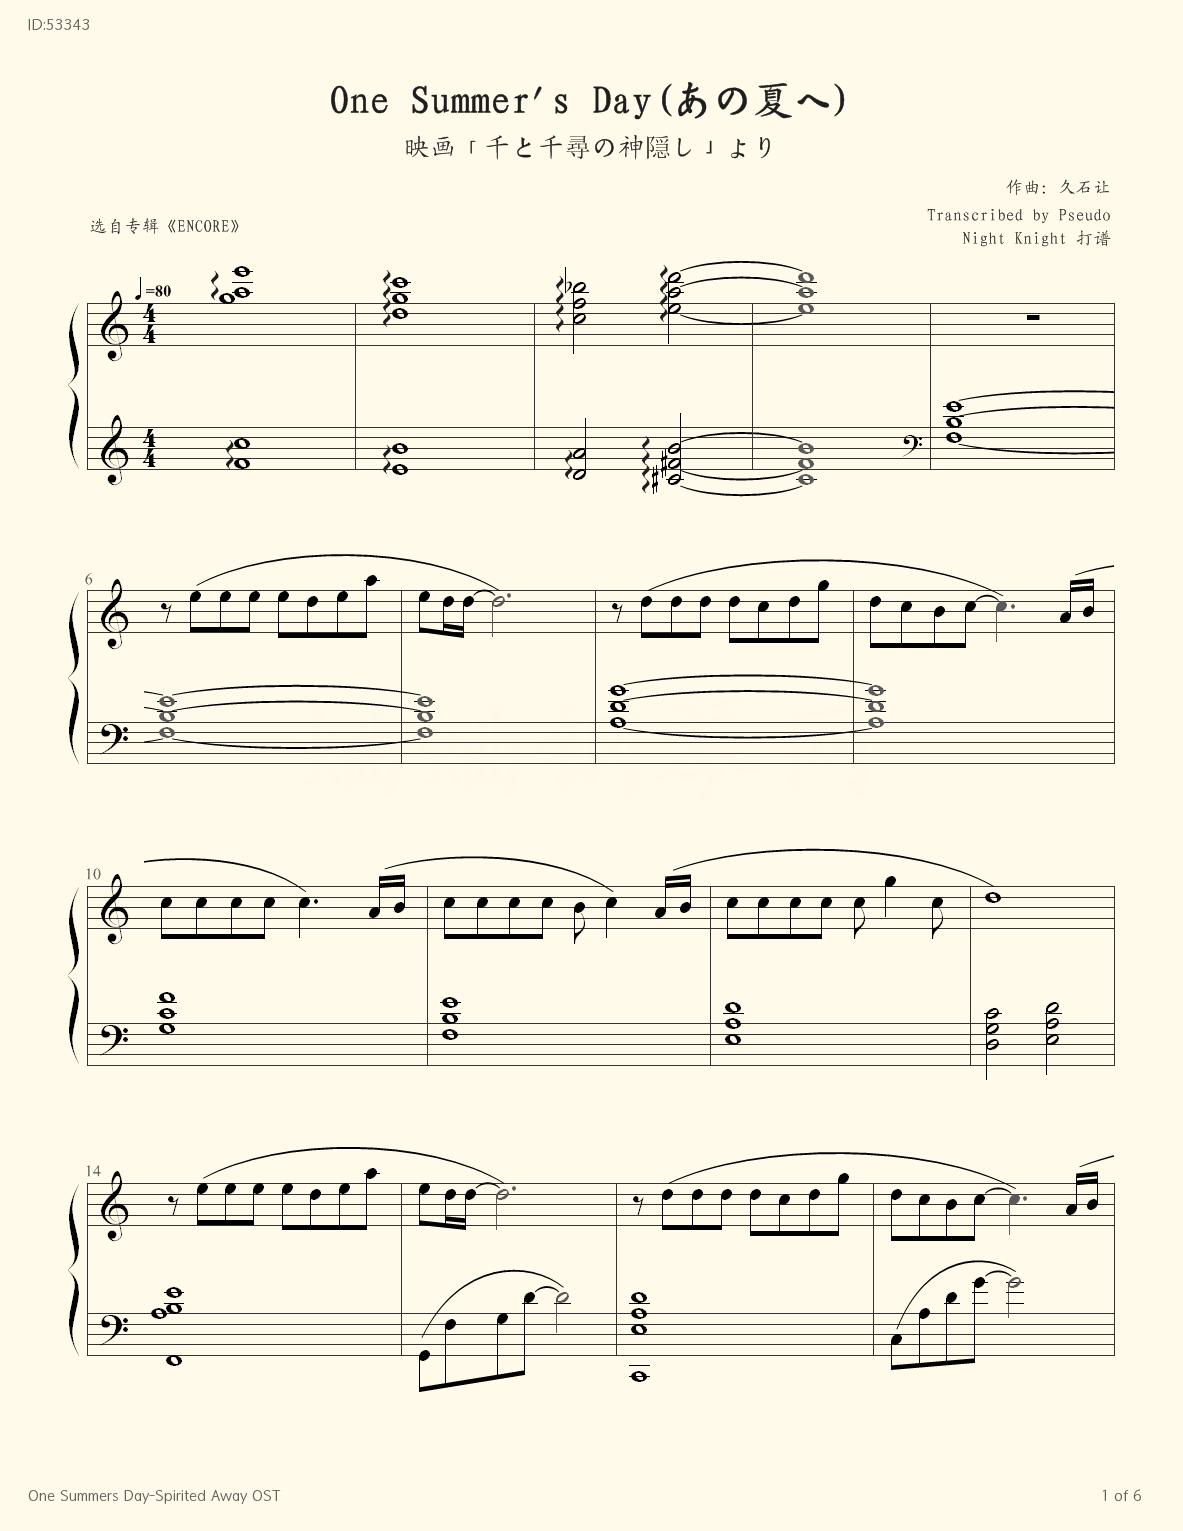 One Summers Day Spirited Away Ost Piano Score Joe Hisaishi Piano Music Fingering Sheet Music Bar